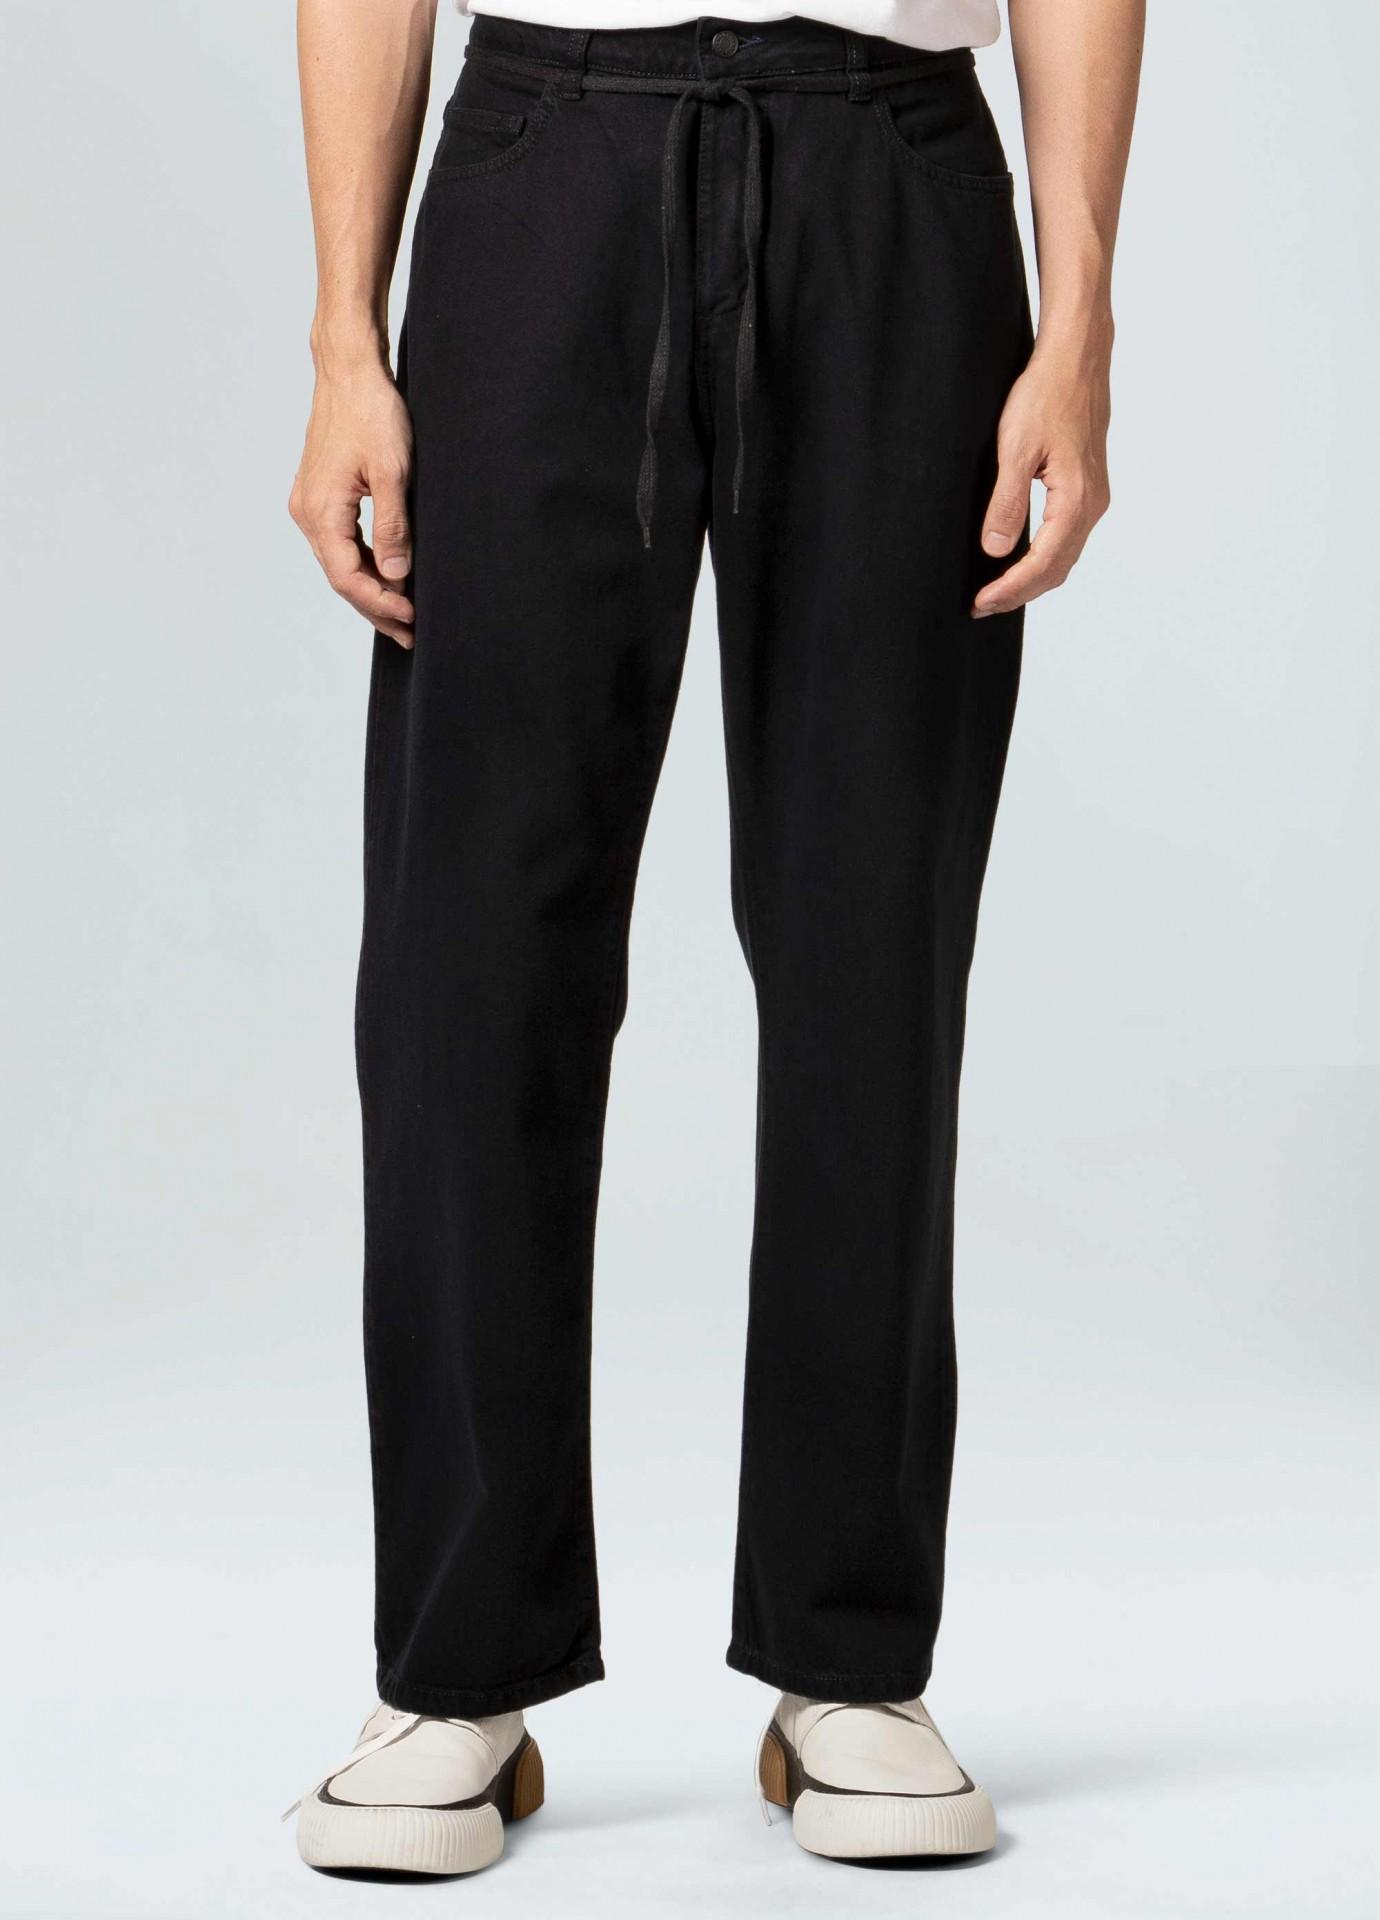 Calça Masculina Osklen Jeans E-Fabrics Street